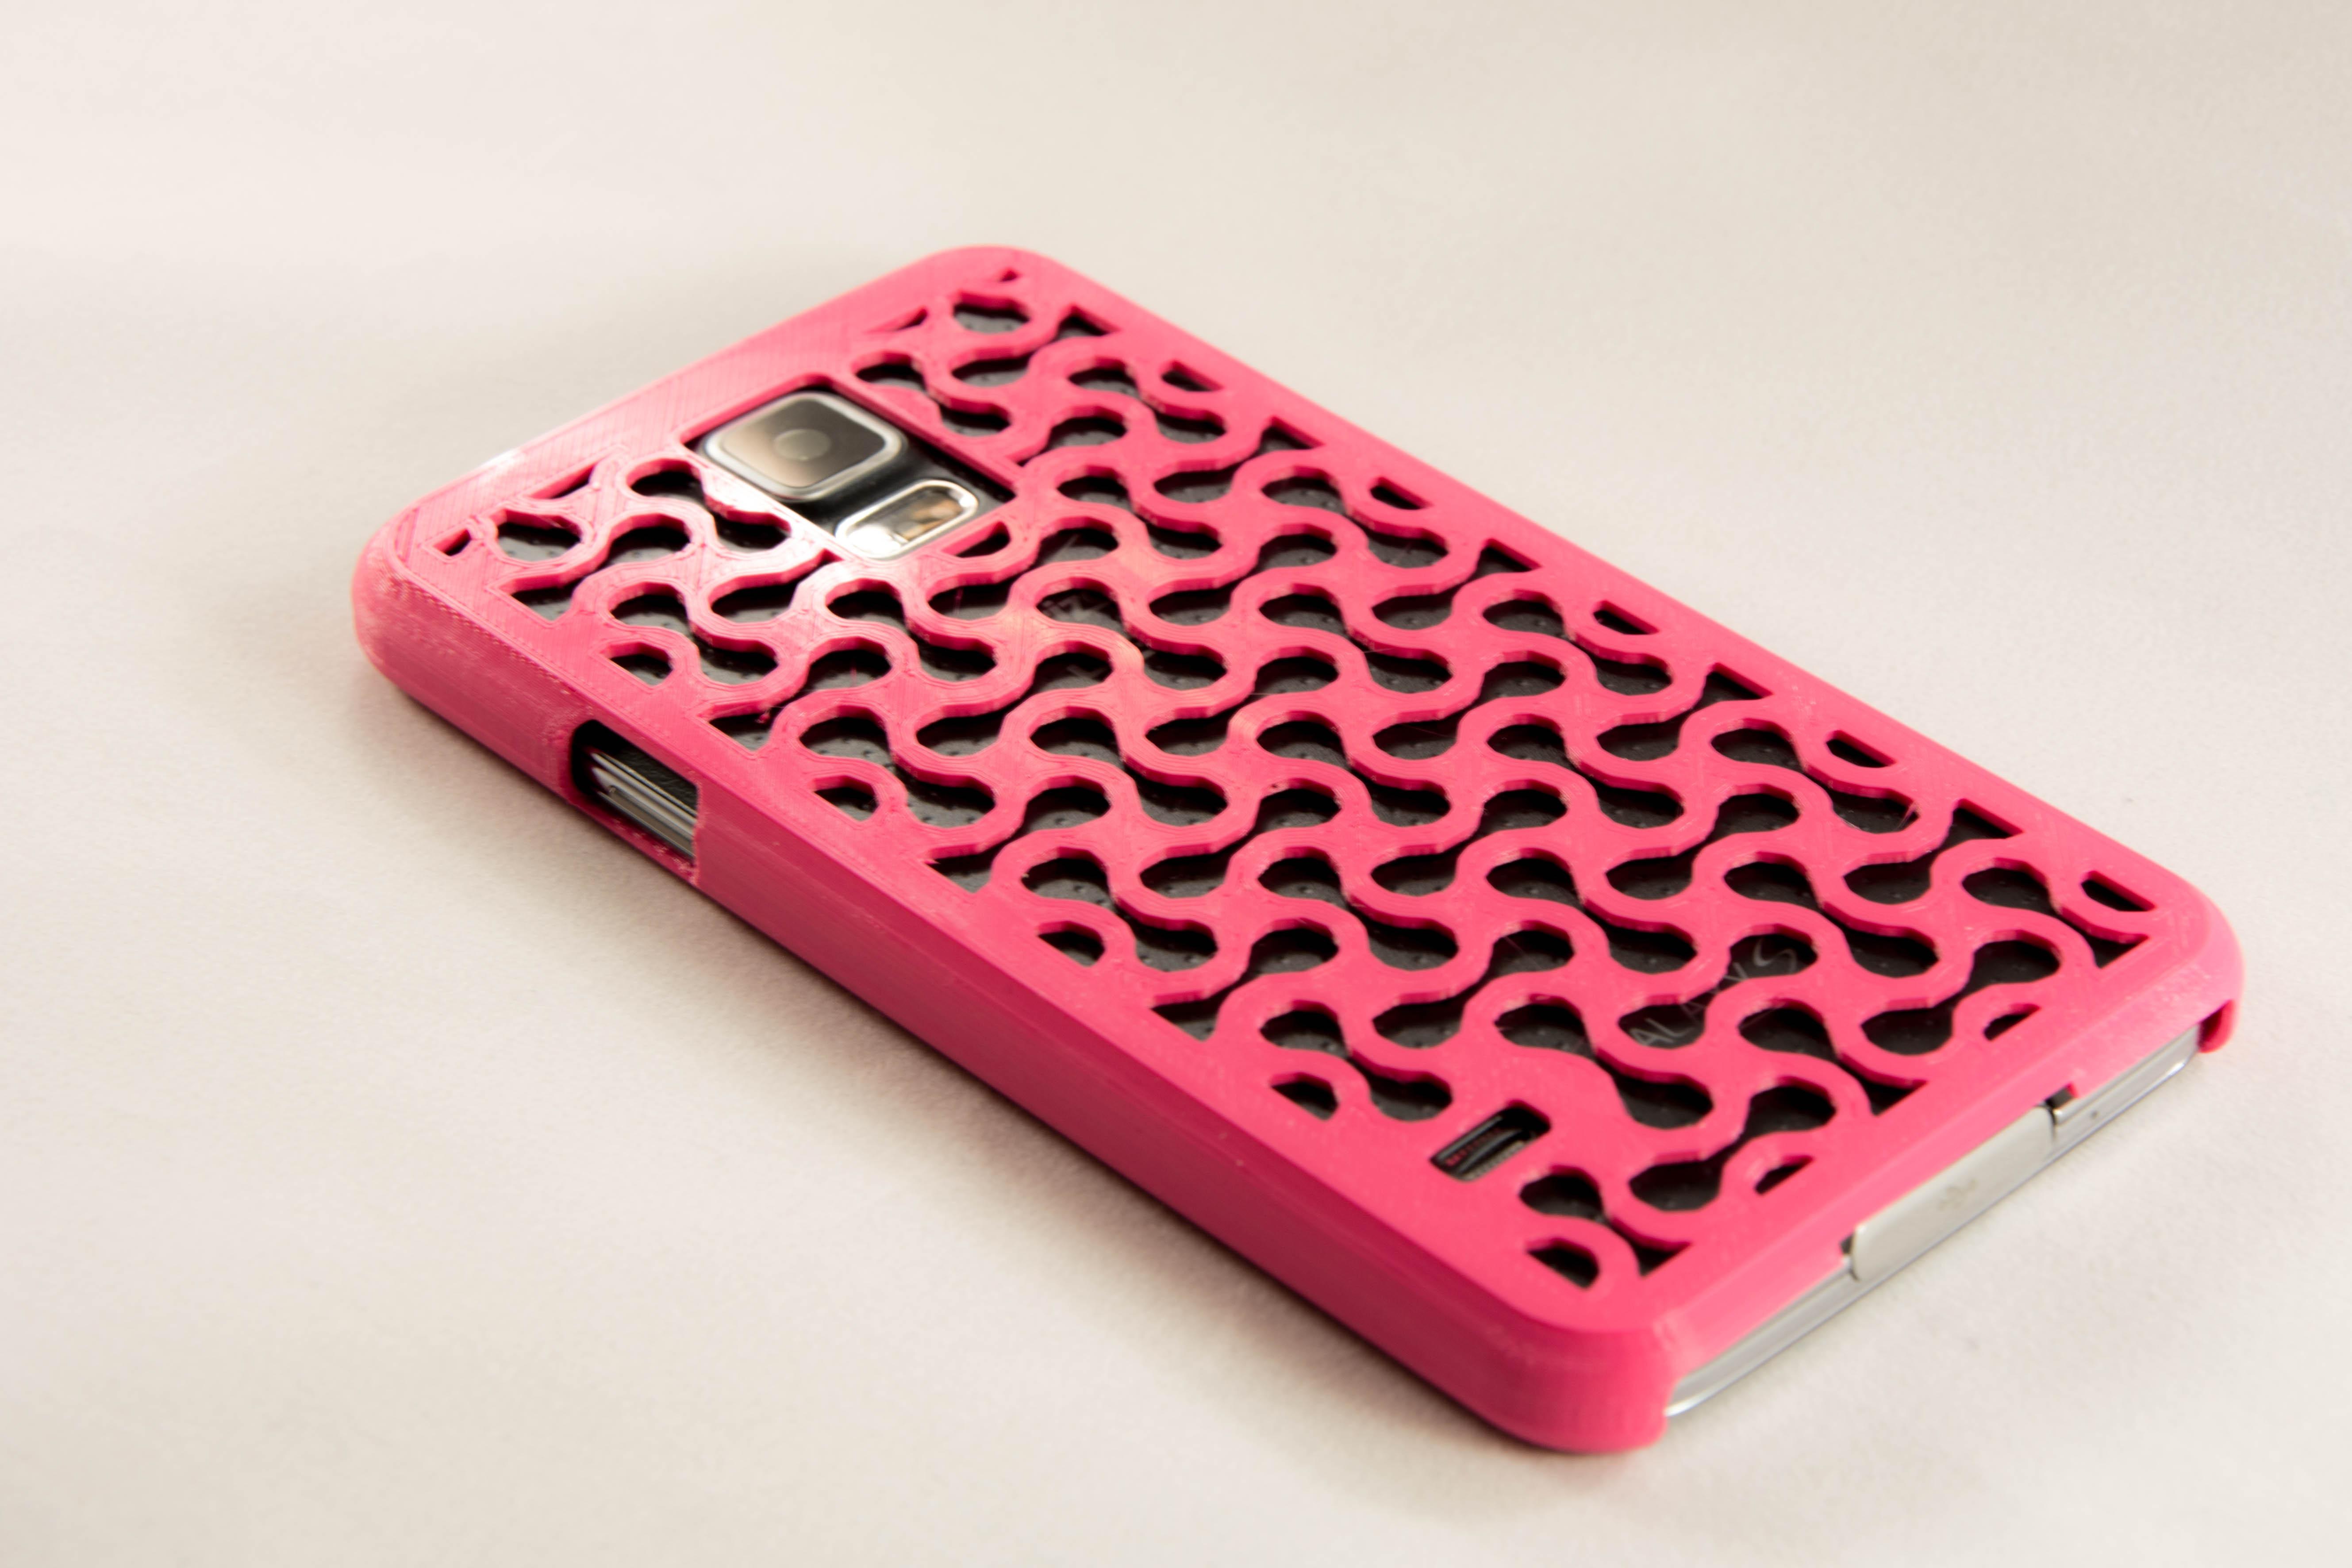 DSC_1578.jpg Download free STL file Galaxy S5 Hard Case • Design to 3D print, Umqais